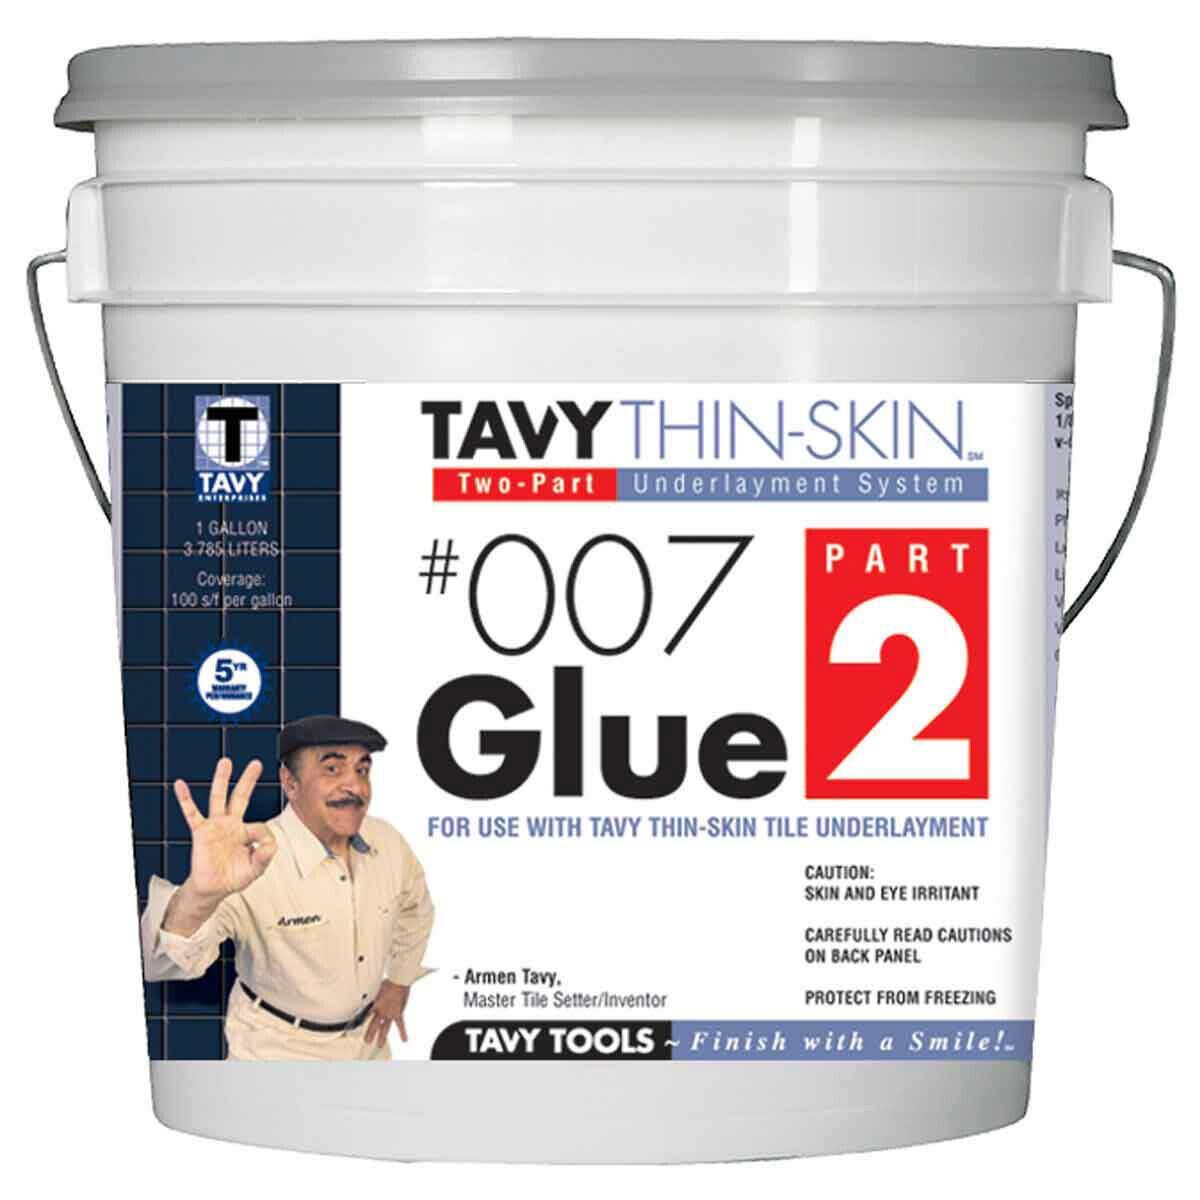 Tavy Thin-Skin #007 Glue